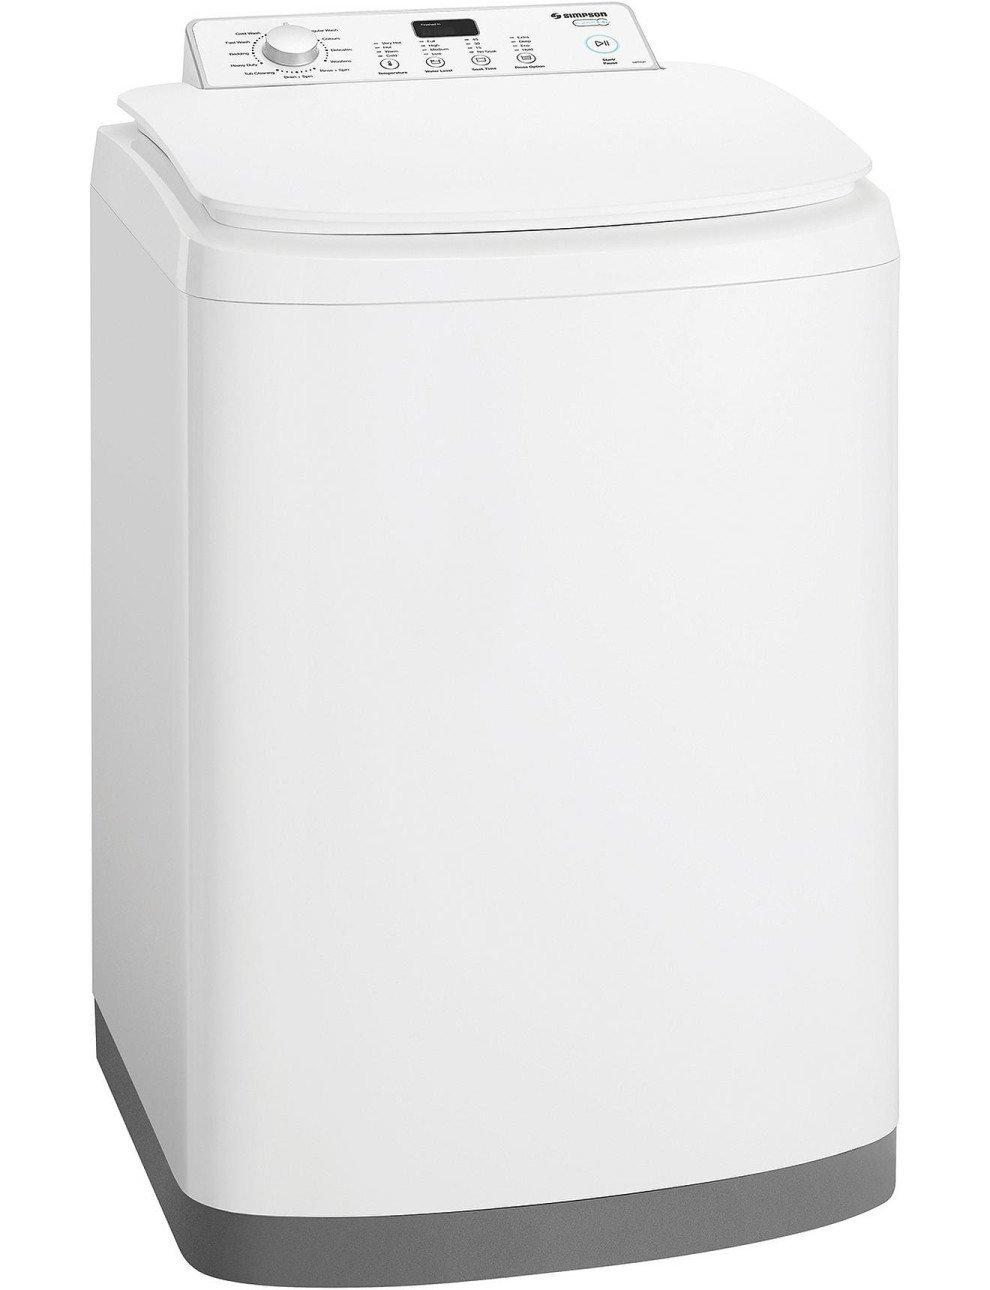 5.5kg Top Load Simpson Washing Machine SWT5541 Hero high.jpeg